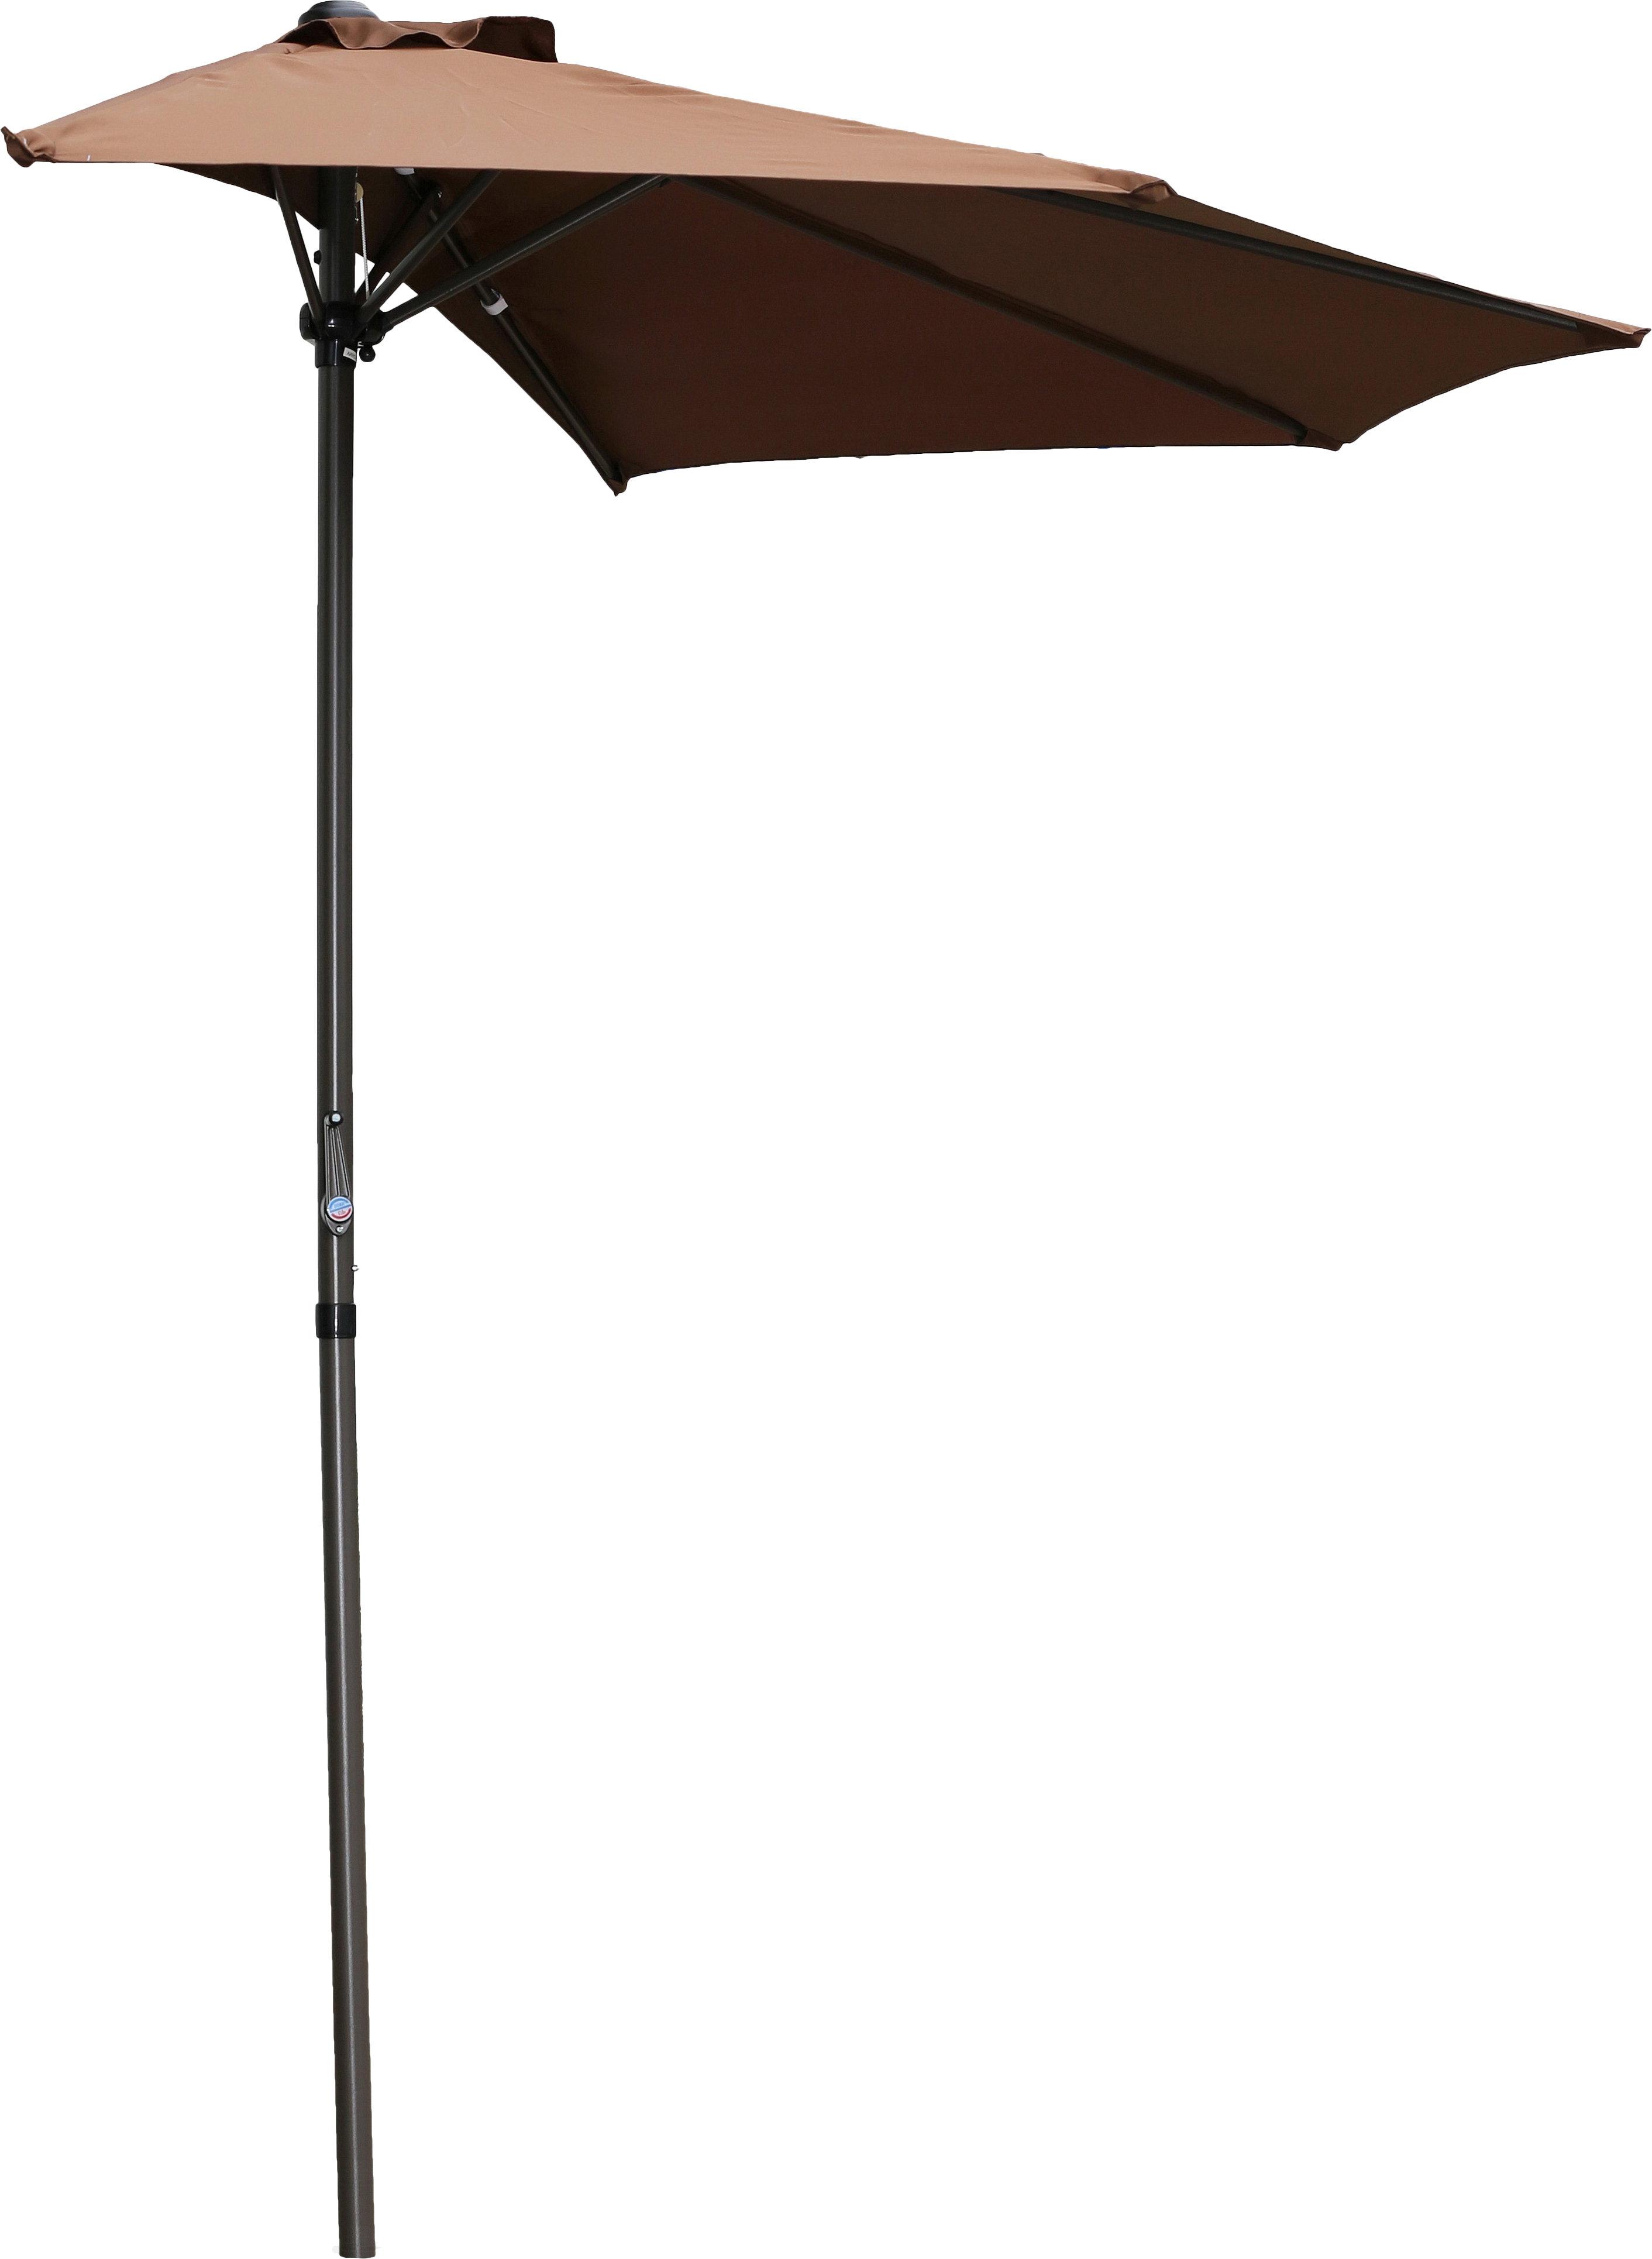 Dade City North 9' Half Market Umbrella With Most Recently Released Norah Rectangular Market Umbrellas (View 20 of 20)